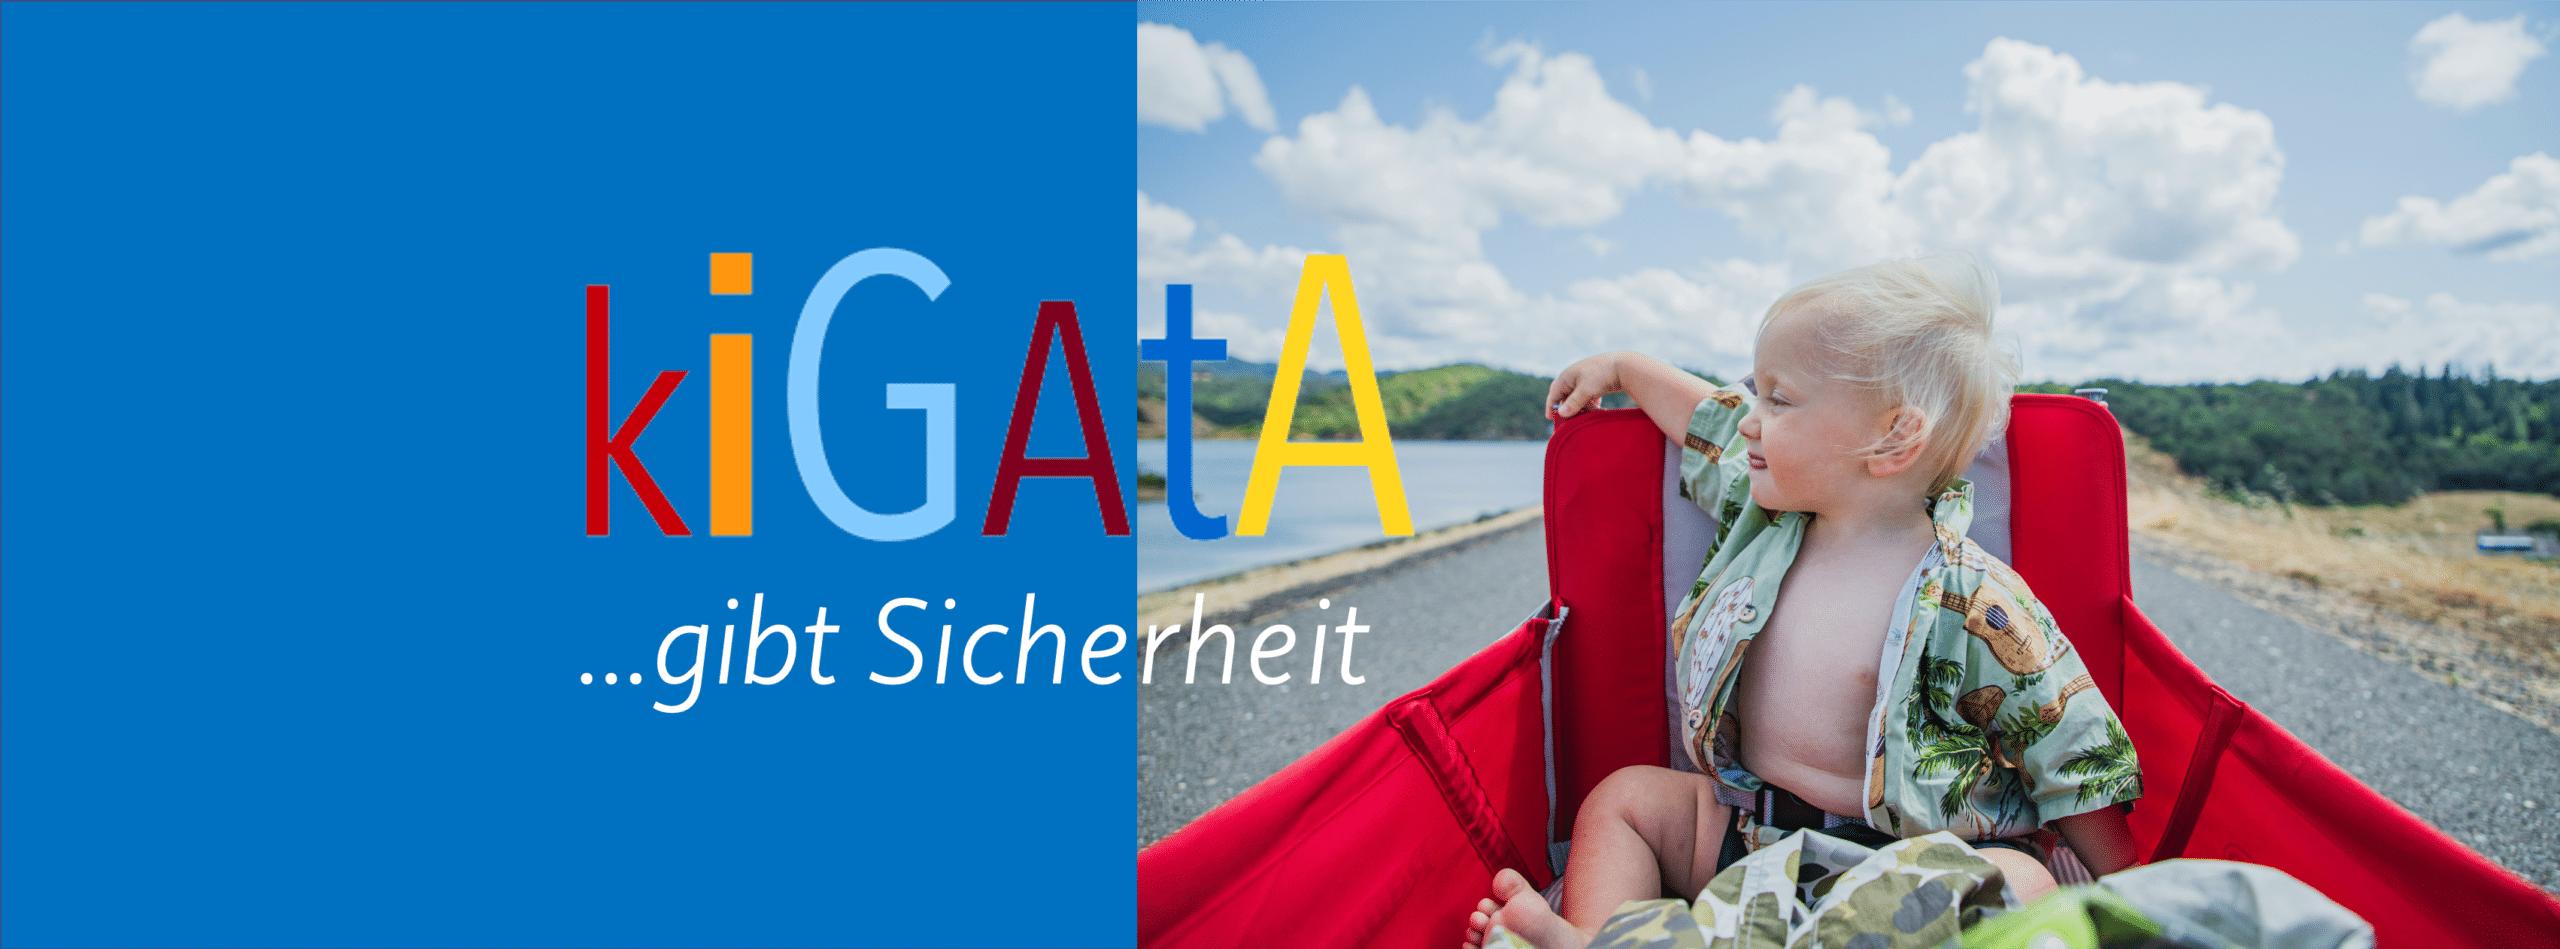 Kigata – Krippenwagen & Fahrzeuge für KiTas & Tagesmütter 2